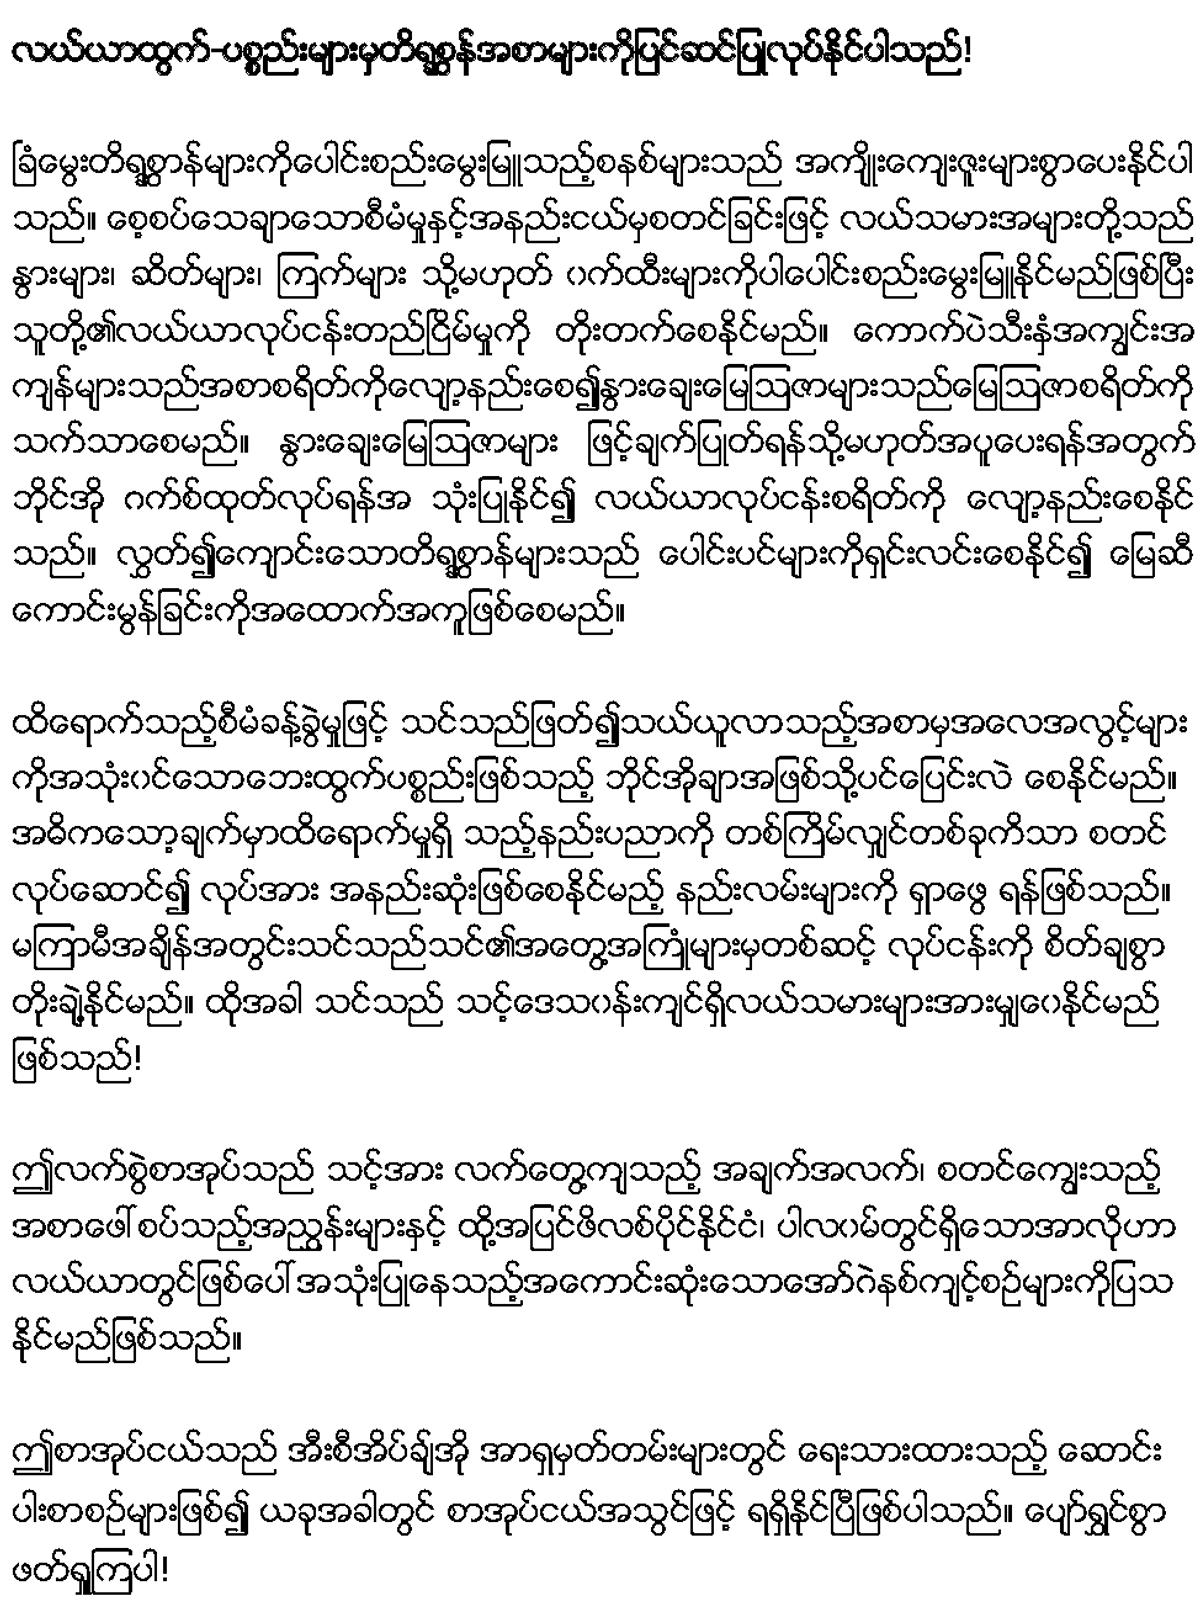 Animal Integration Burmese back cover text